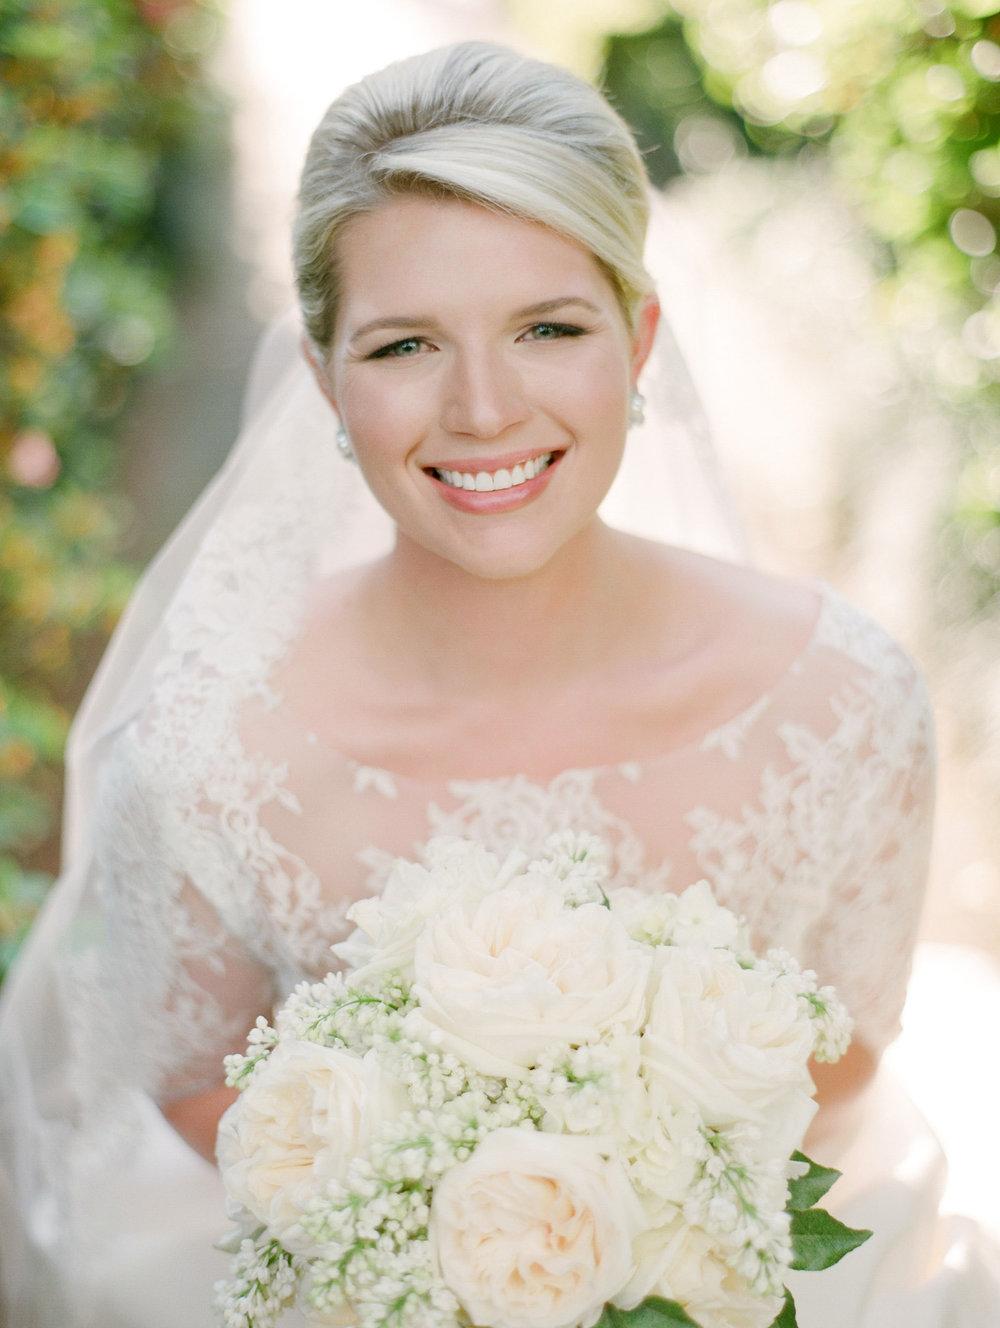 0012_0012_Houston-Film-Bridal-Beauty-Photographer.jpg